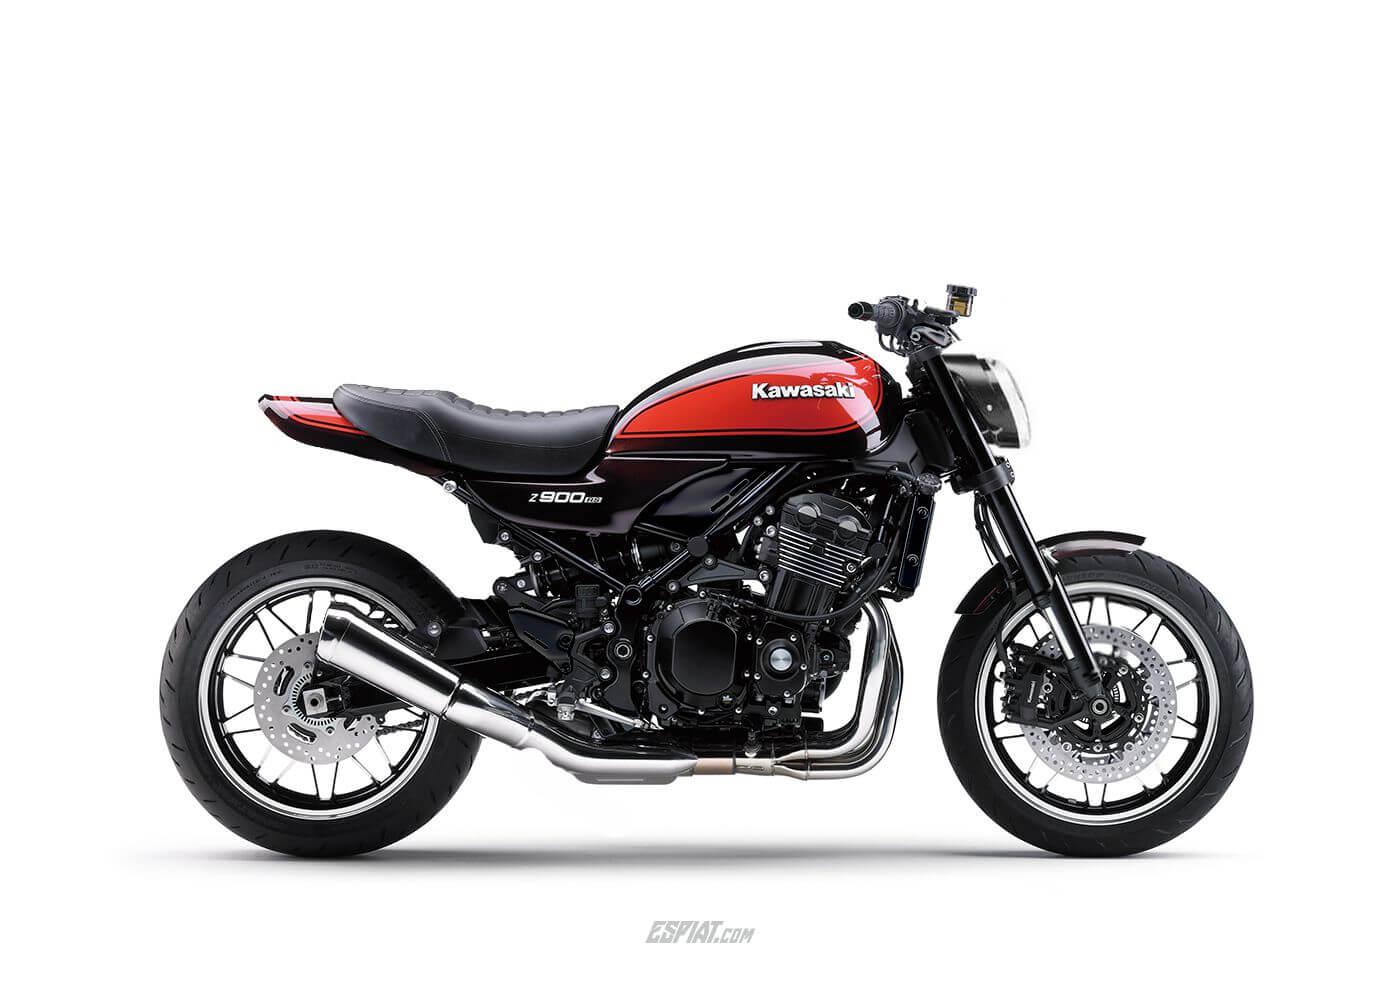 kawasaki-z900-rs-red-rs-cafe-racer-umbau-heck-kuerzen(1)